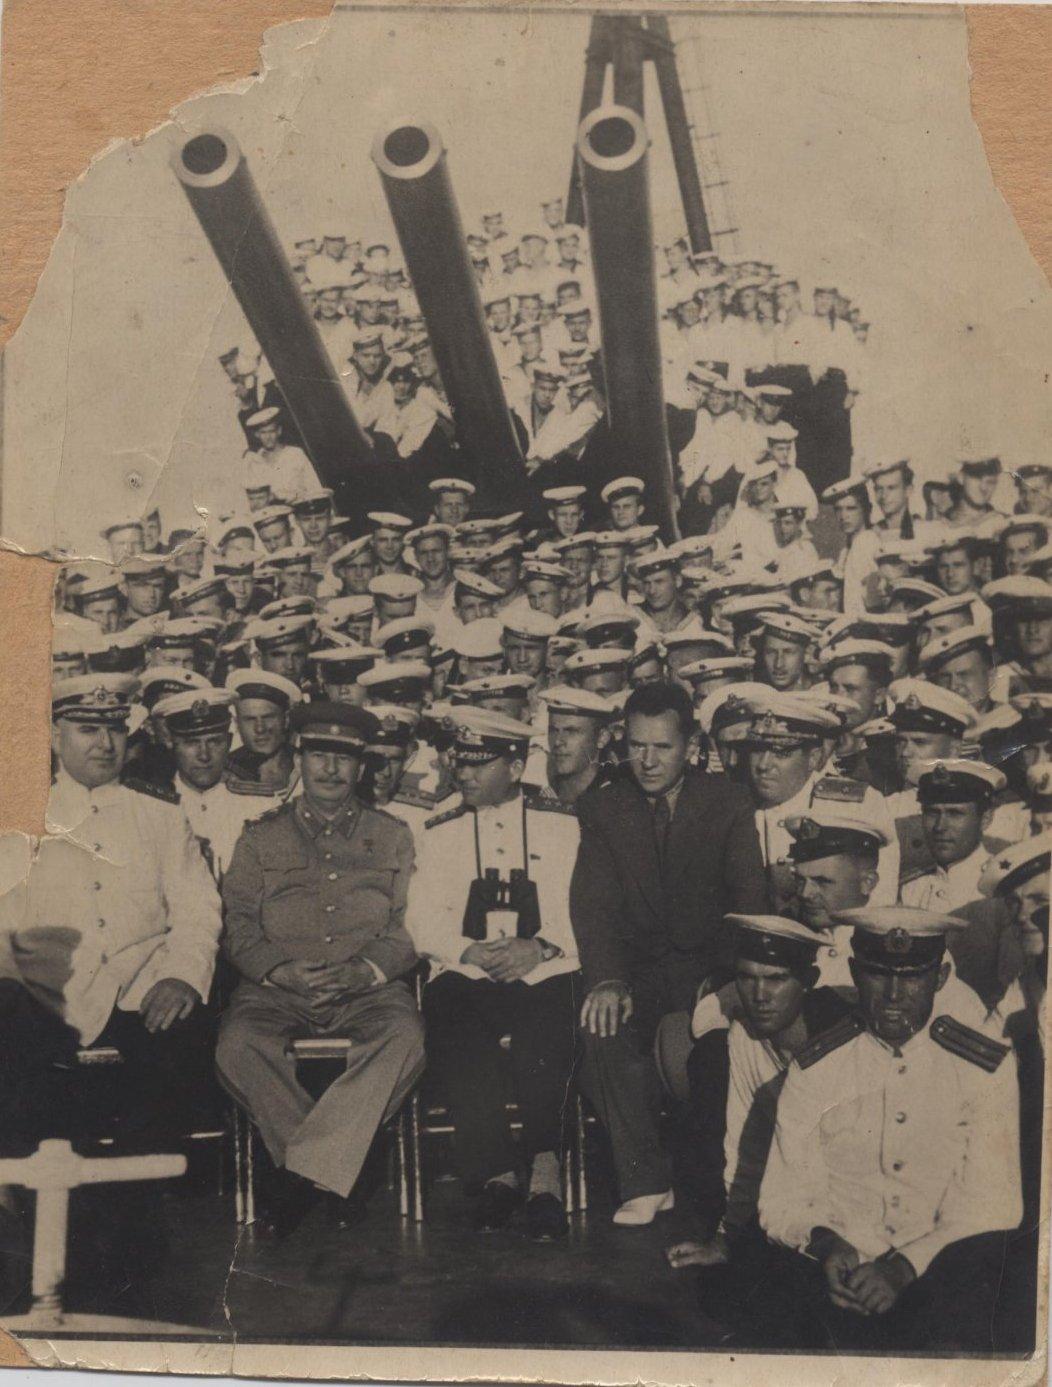 1947. И.В. Сталин и А.Н. Косыгин среди экипажа на крейсере Молотов, 19 августа